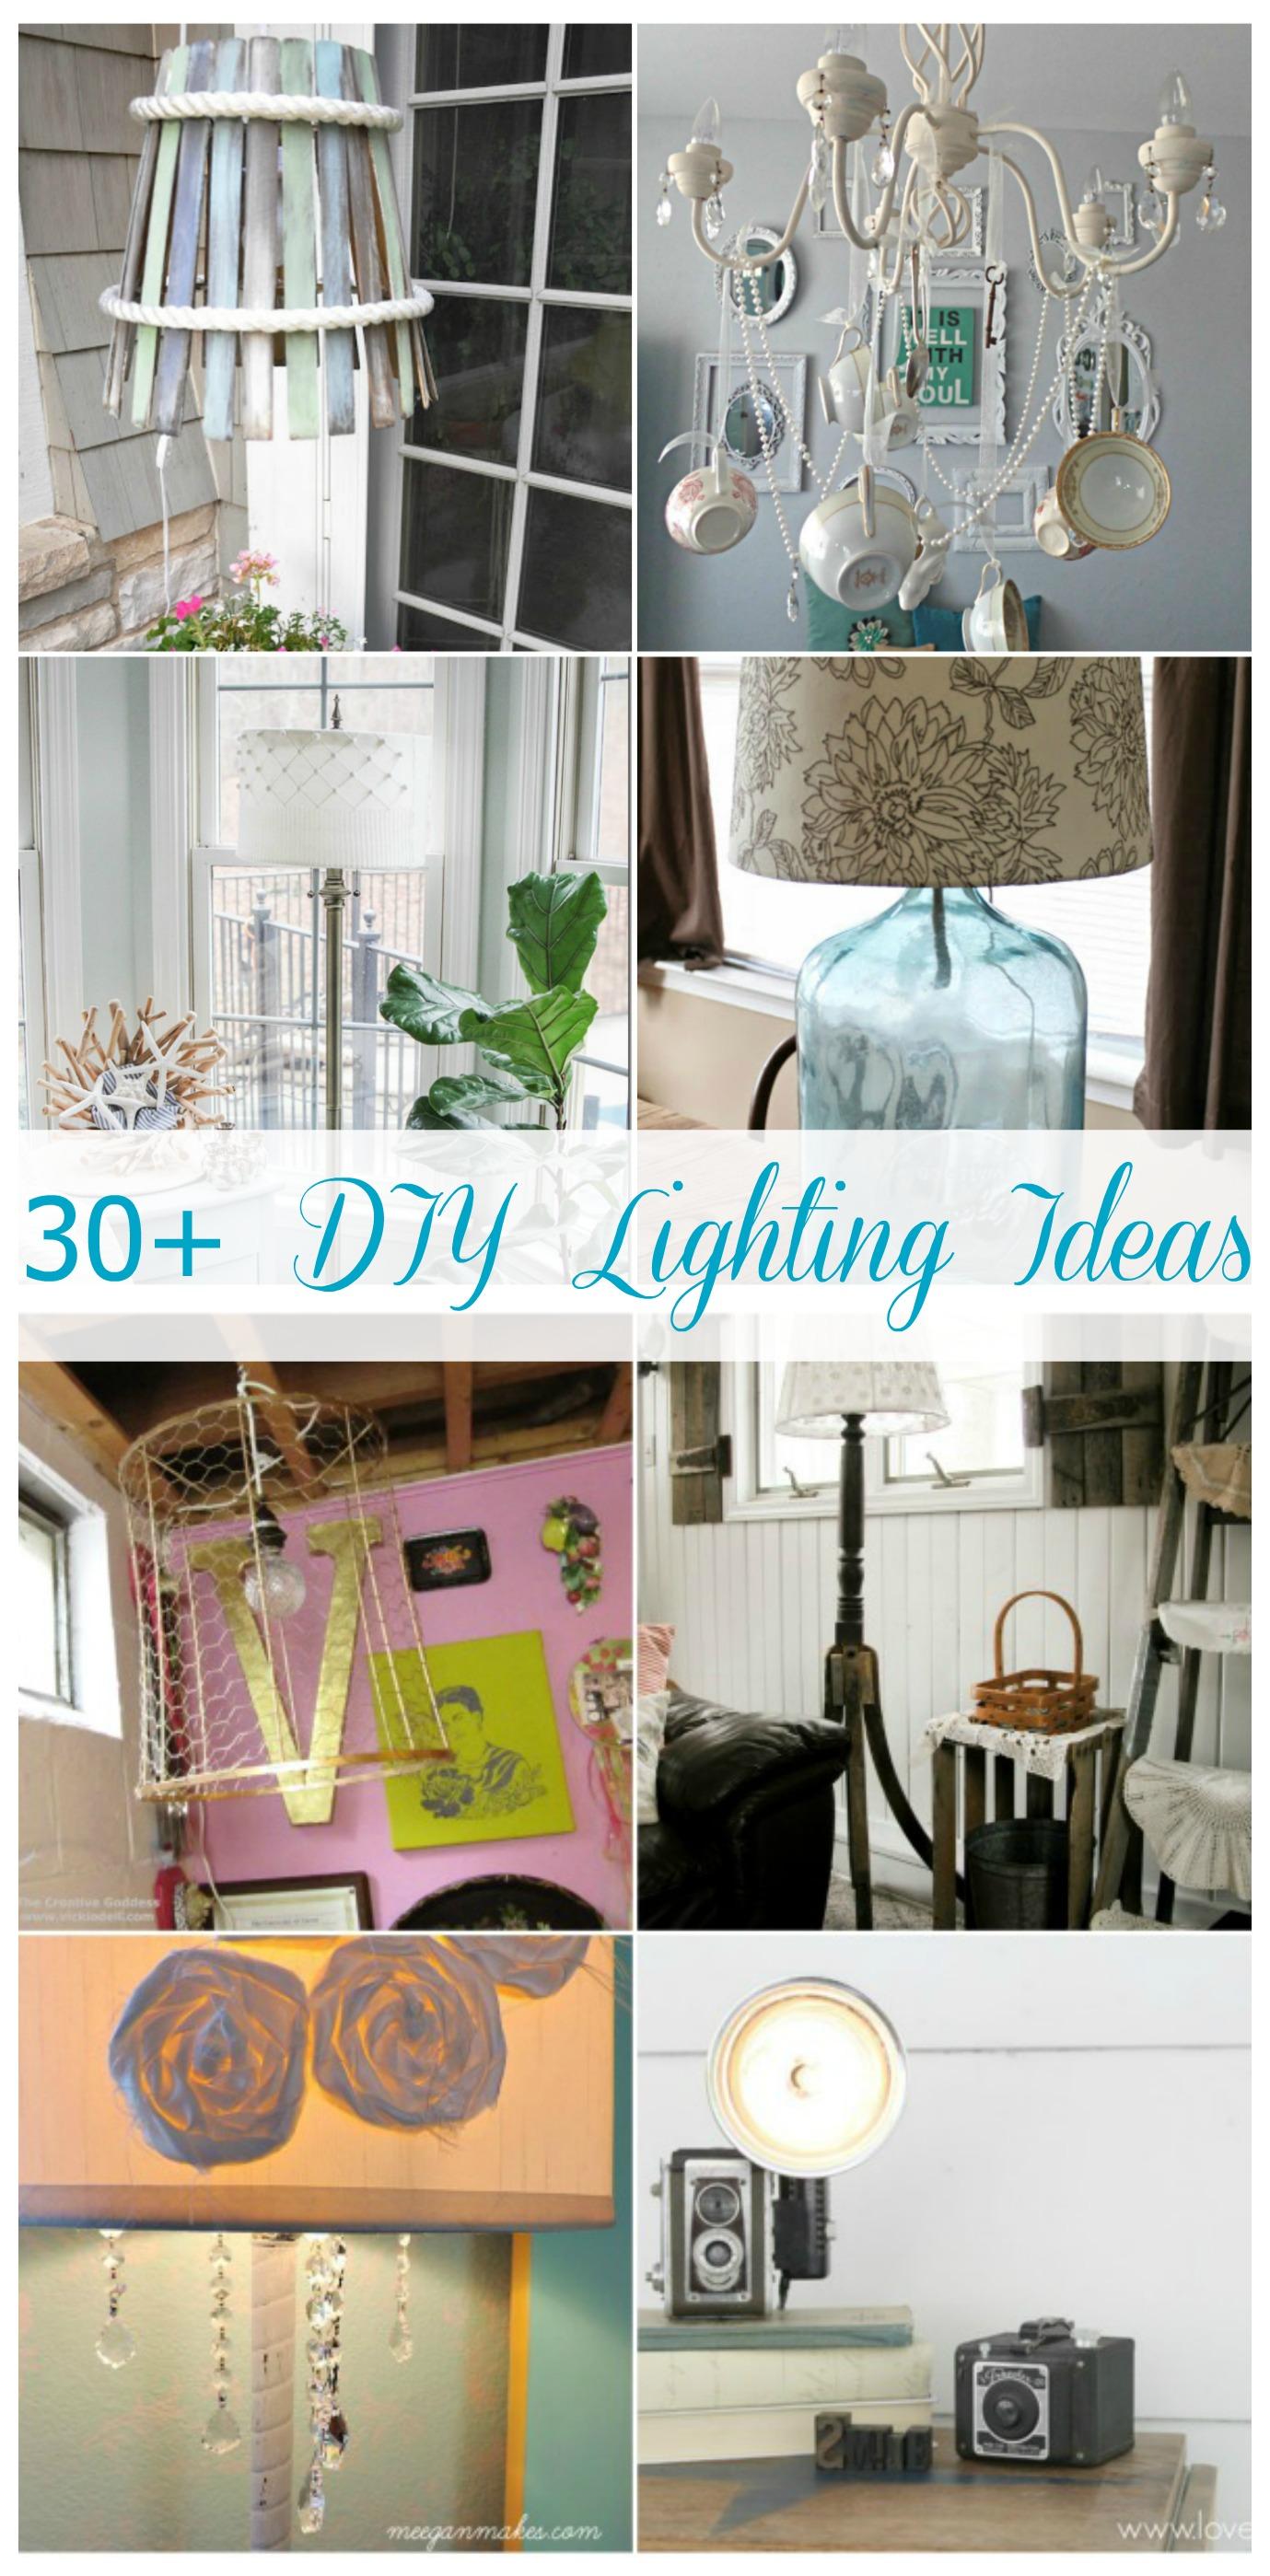 30+ DIY Lighting Ideas